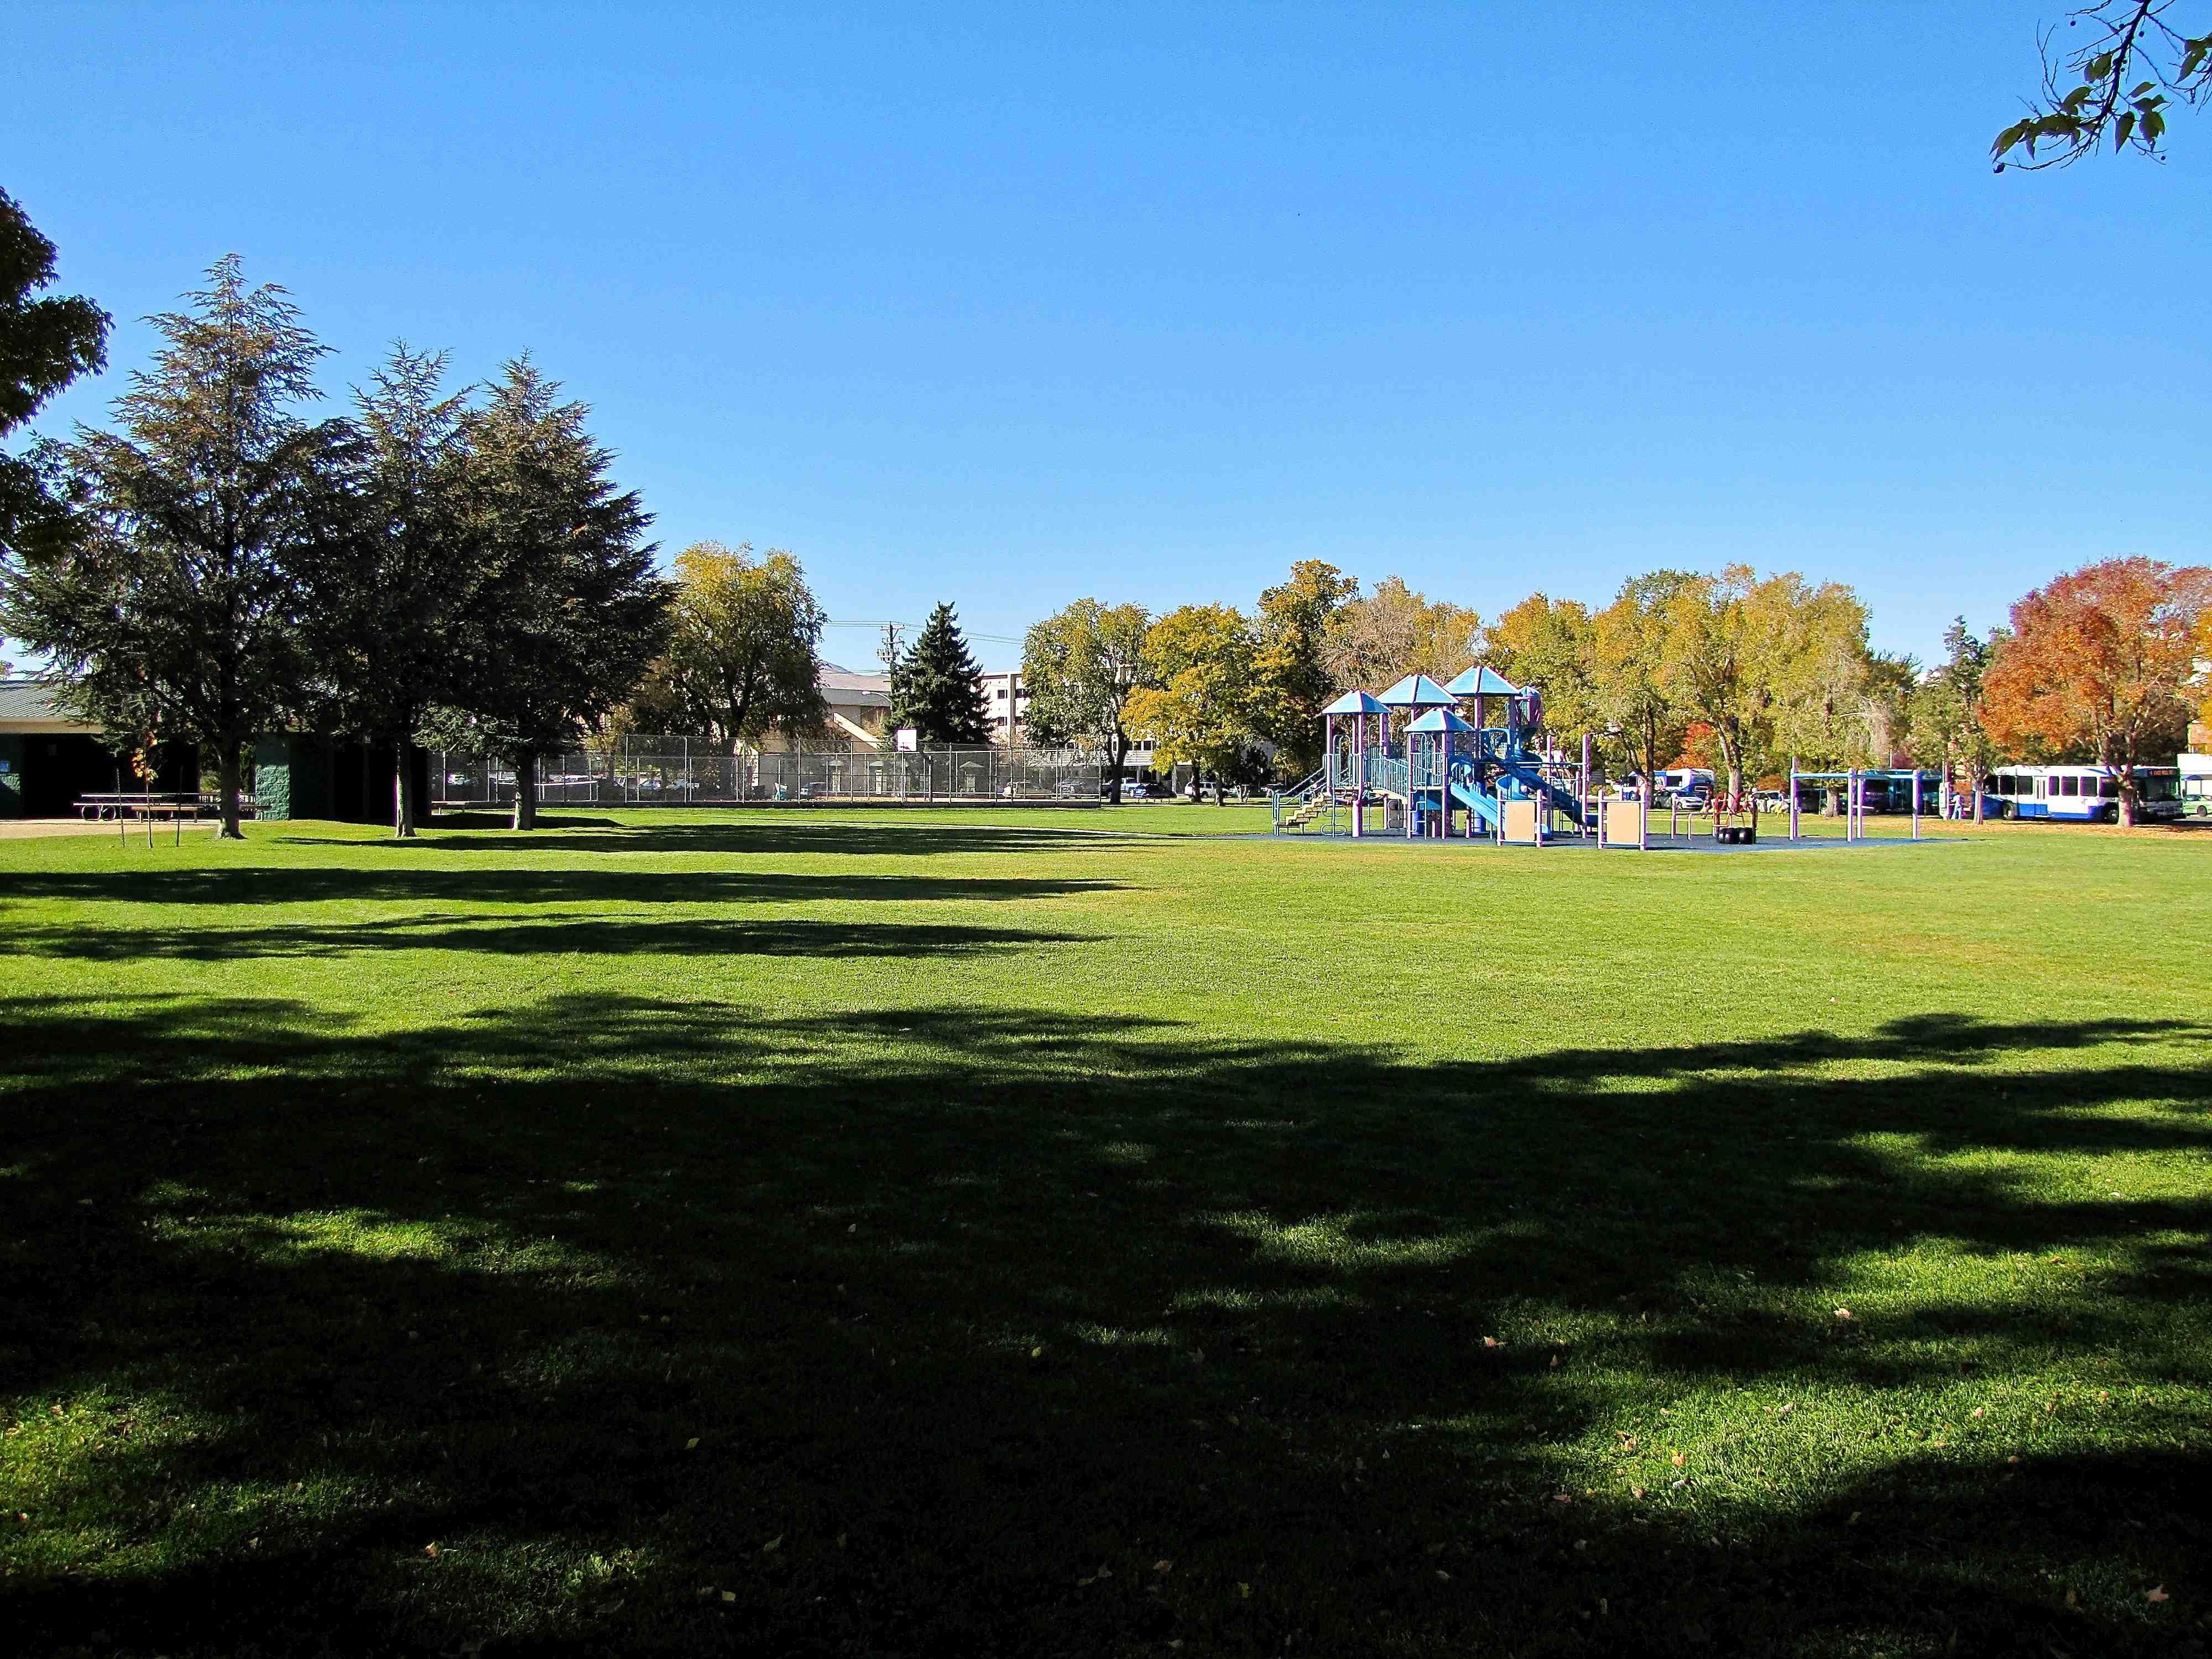 1 Pickett Park (Reno) Site 1 Fall 2013 (Low)